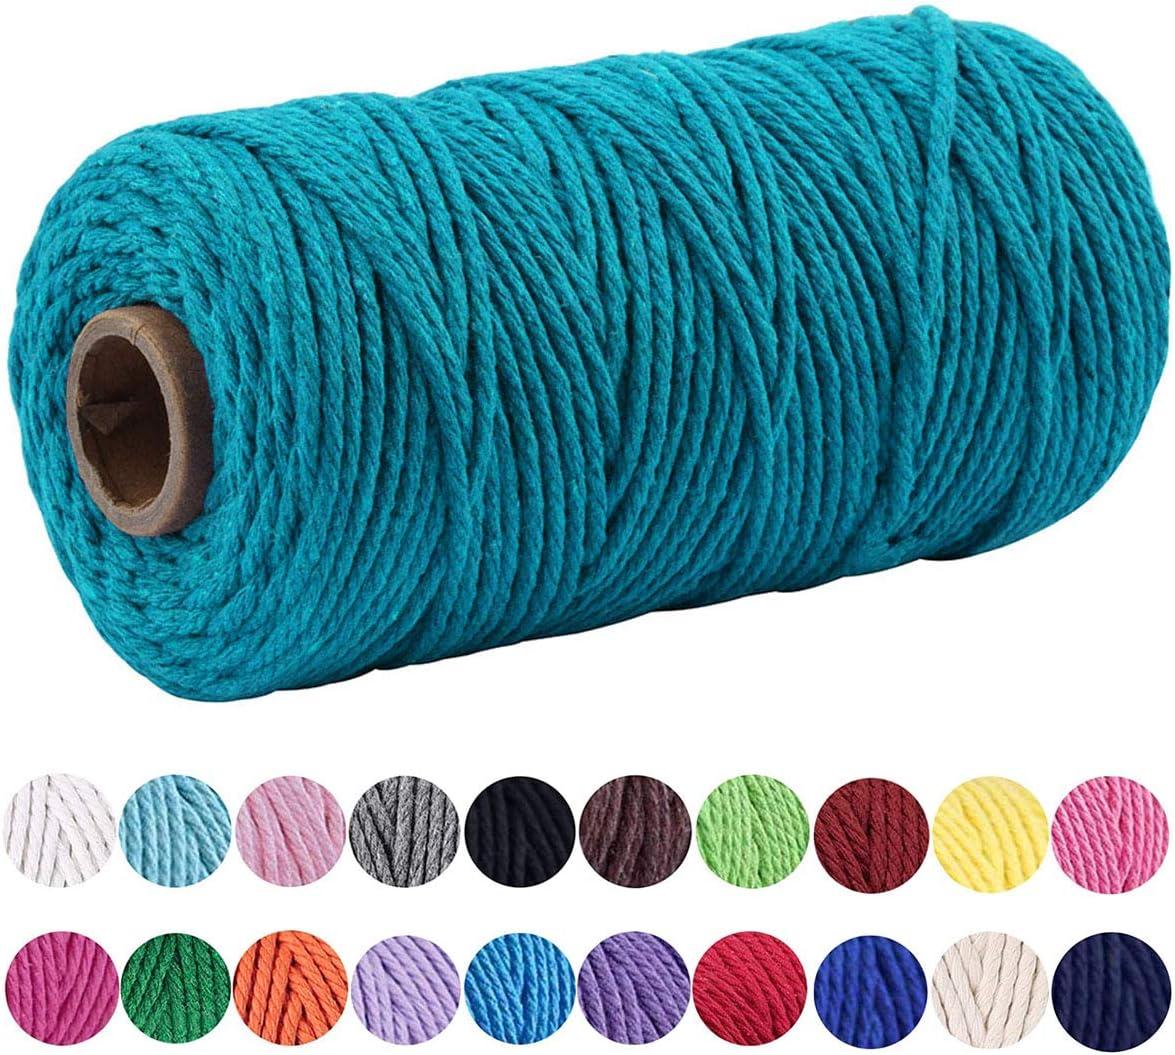 Macrame Cord 3mm 109 Yard 100% Natural Cotton Wall Hanging Plant Hanger DIY Craft Making Knitting Cord Rope Christmas Wedding Decor (Peacock Blue)